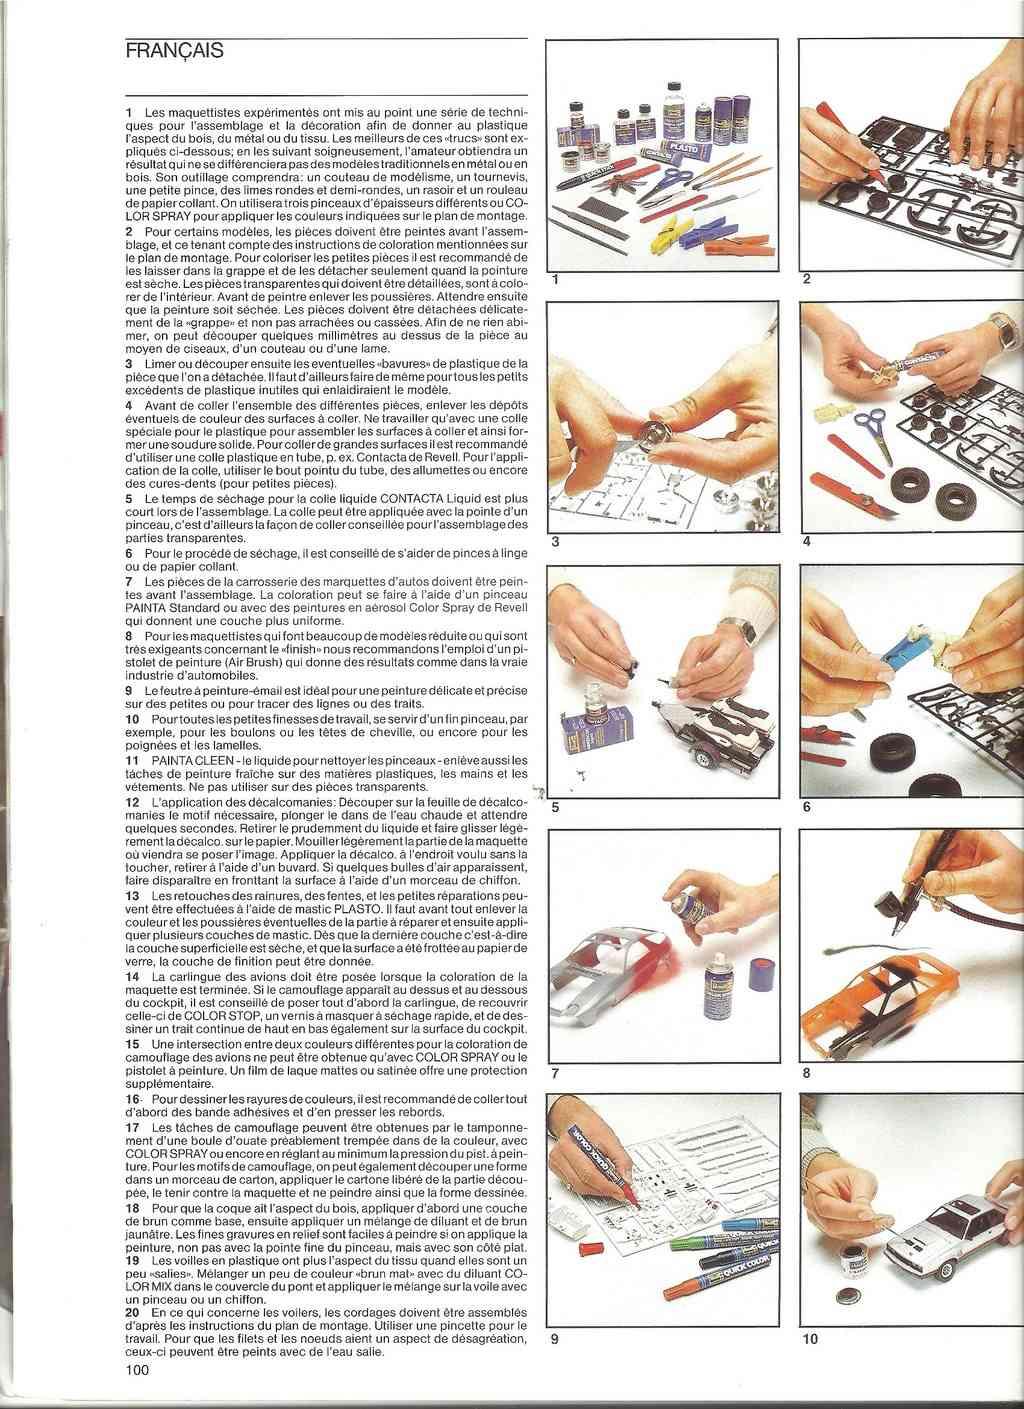 1984 - [REVELL 1984] Catalogue 1984  Revel222